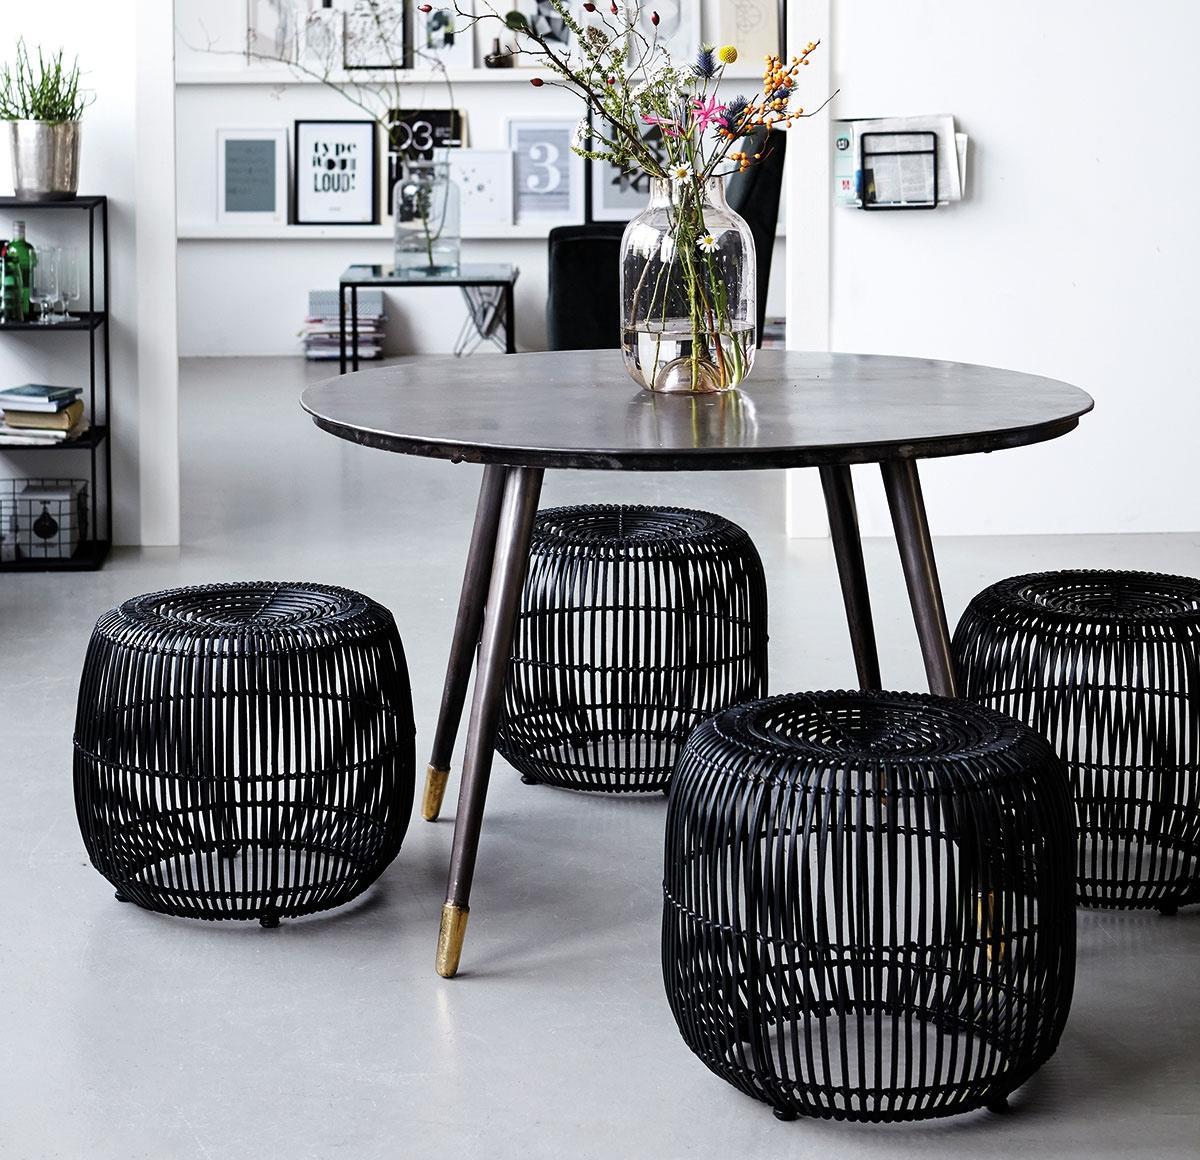 betonlook tegels woonkamer thomas gaspersz. Black Bedroom Furniture Sets. Home Design Ideas